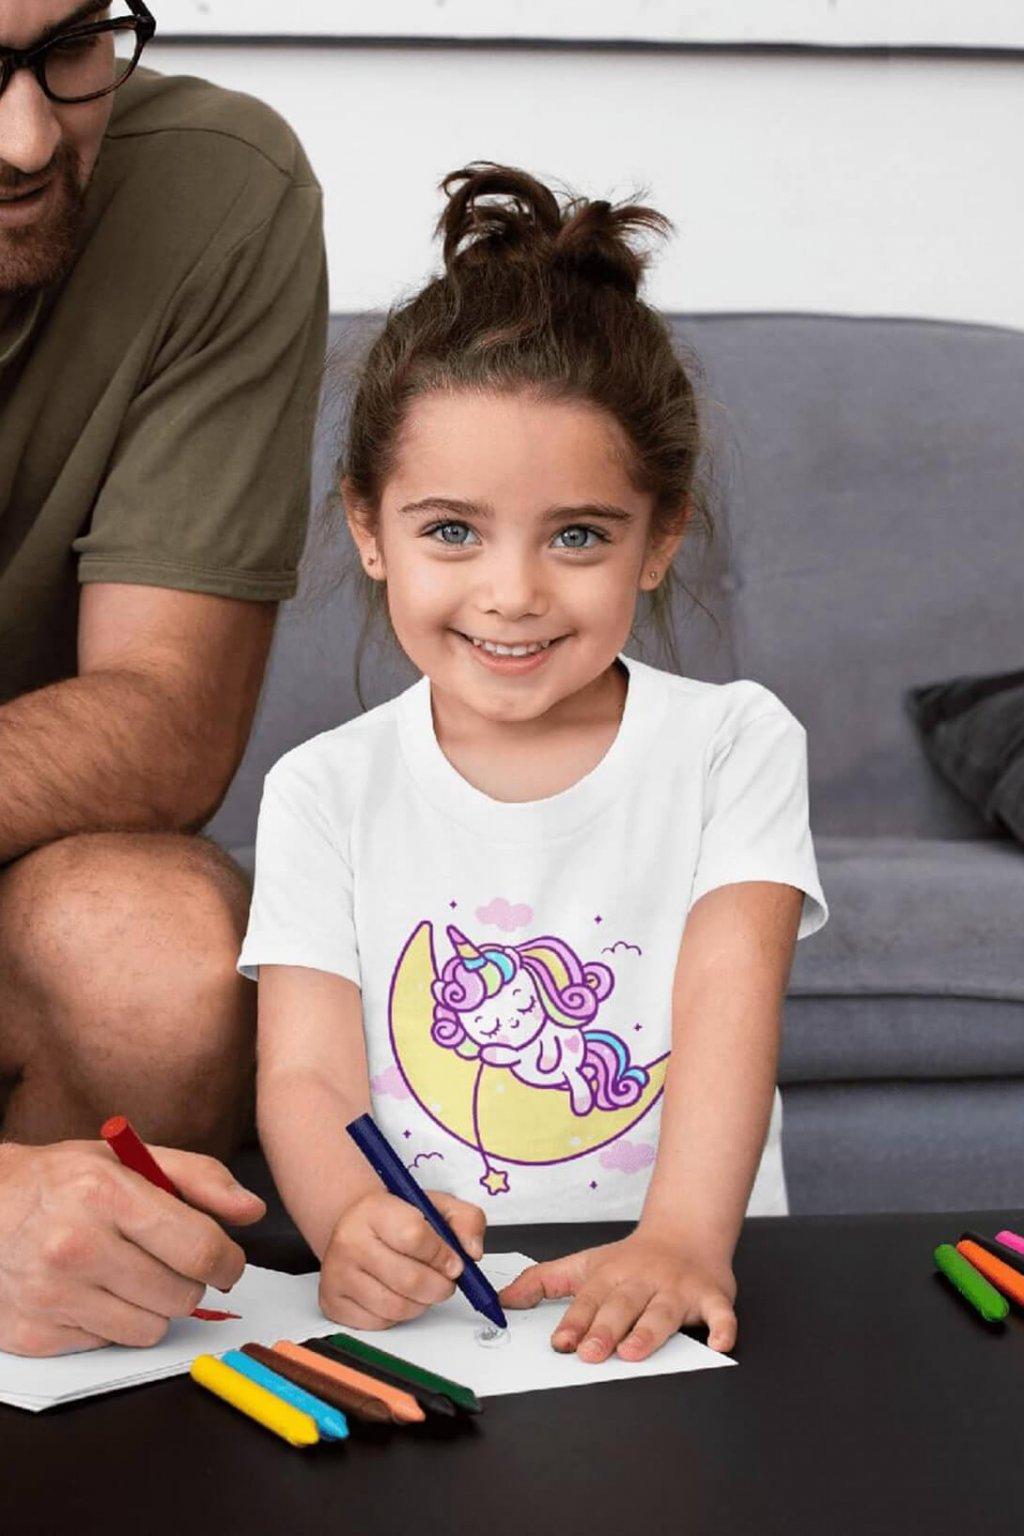 Dievčenské tričko Spiaci jednorožec